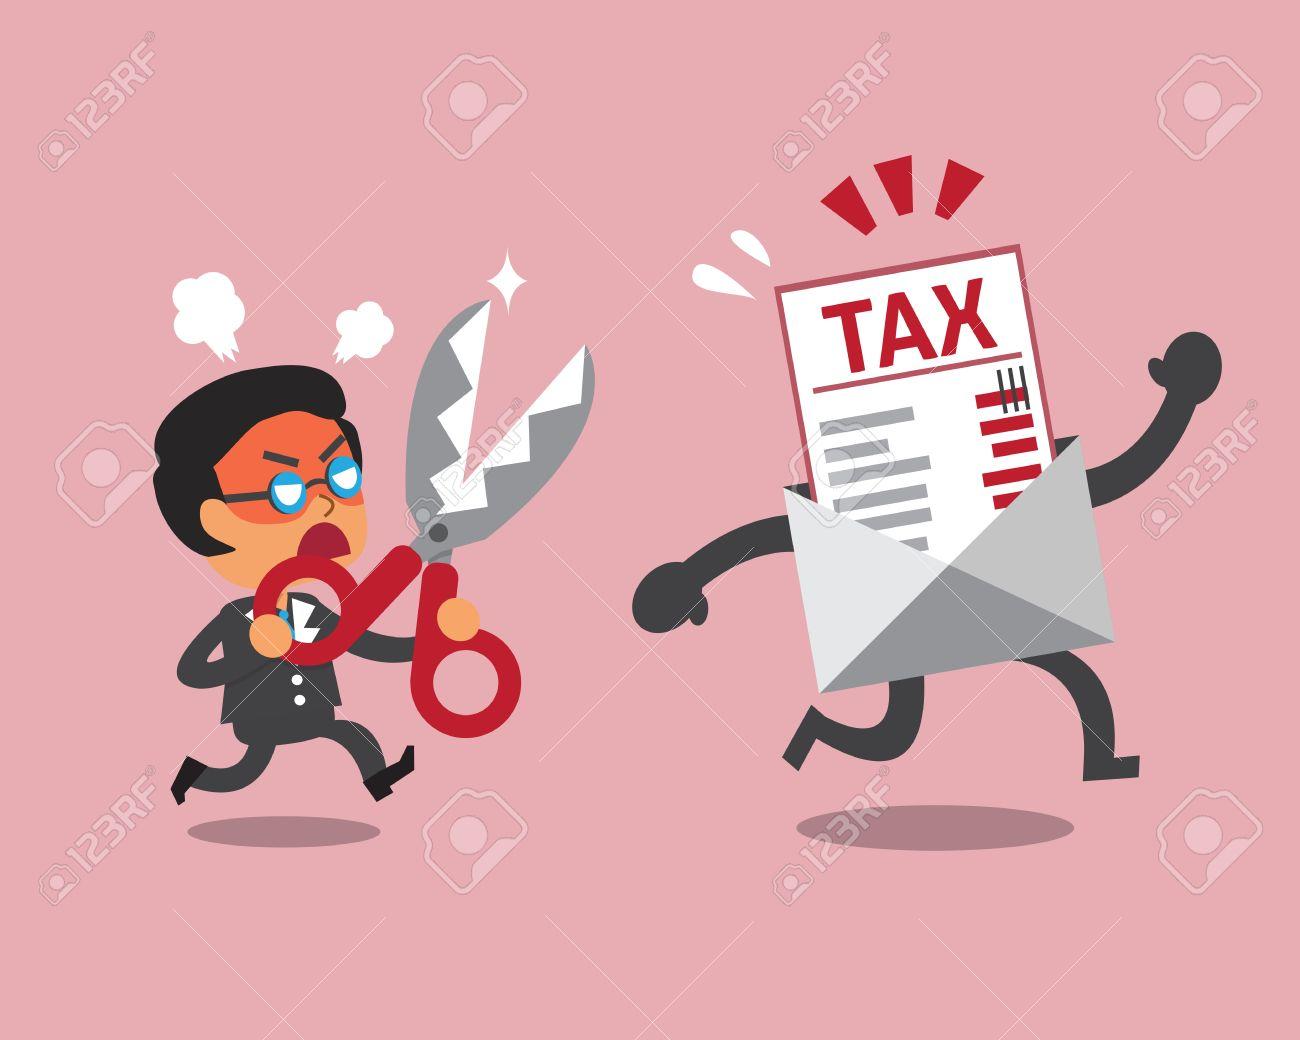 Cartoon businessman holding scissors to cut tax letter - 49126137